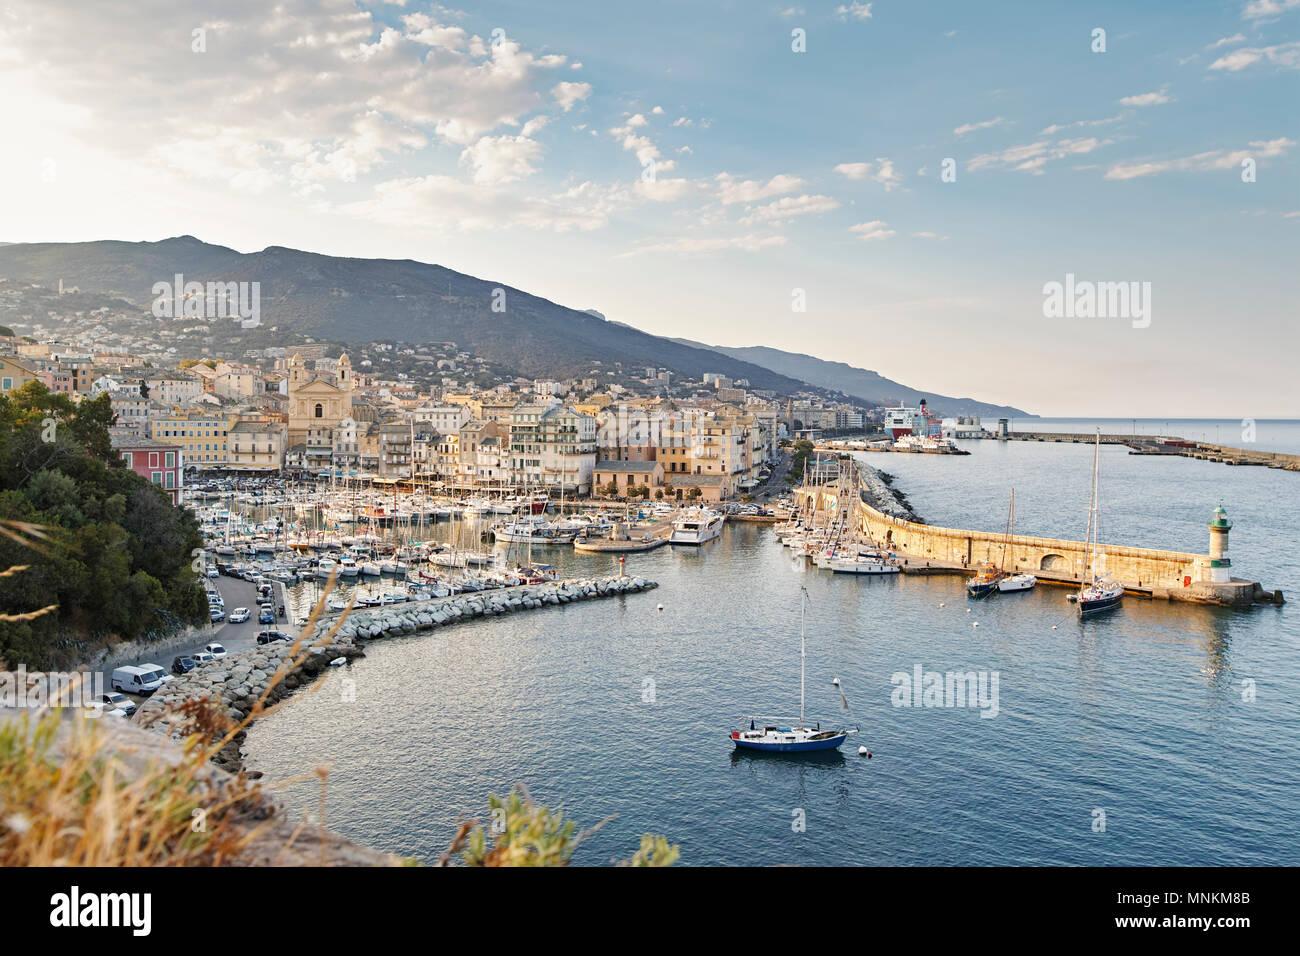 Bastia Port, Corsica France - Stock Image